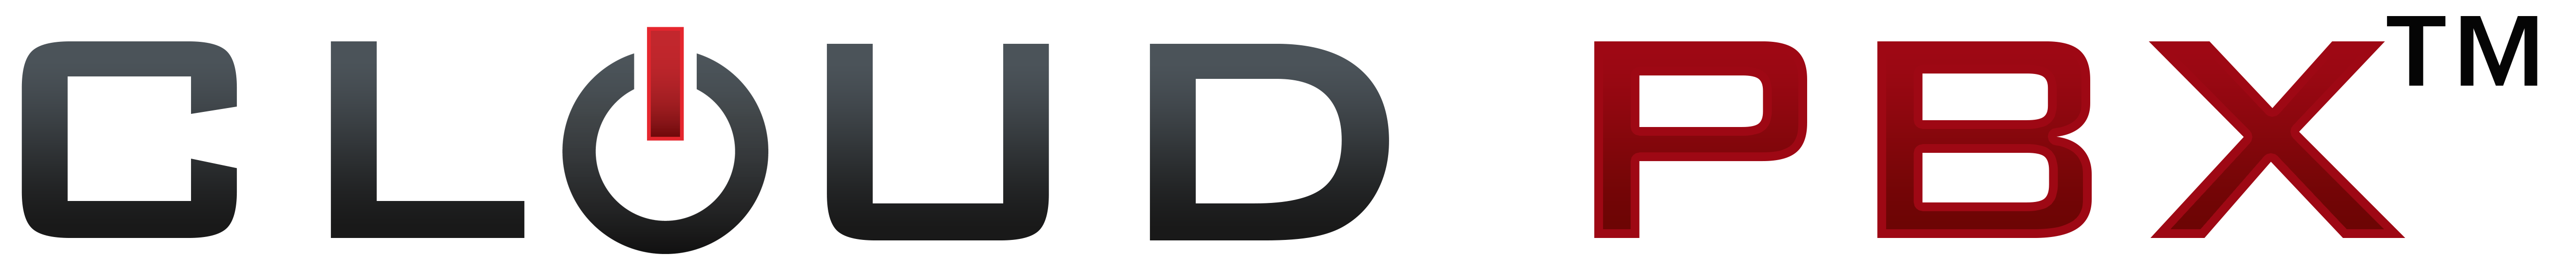 Cloud PBX Logo.png